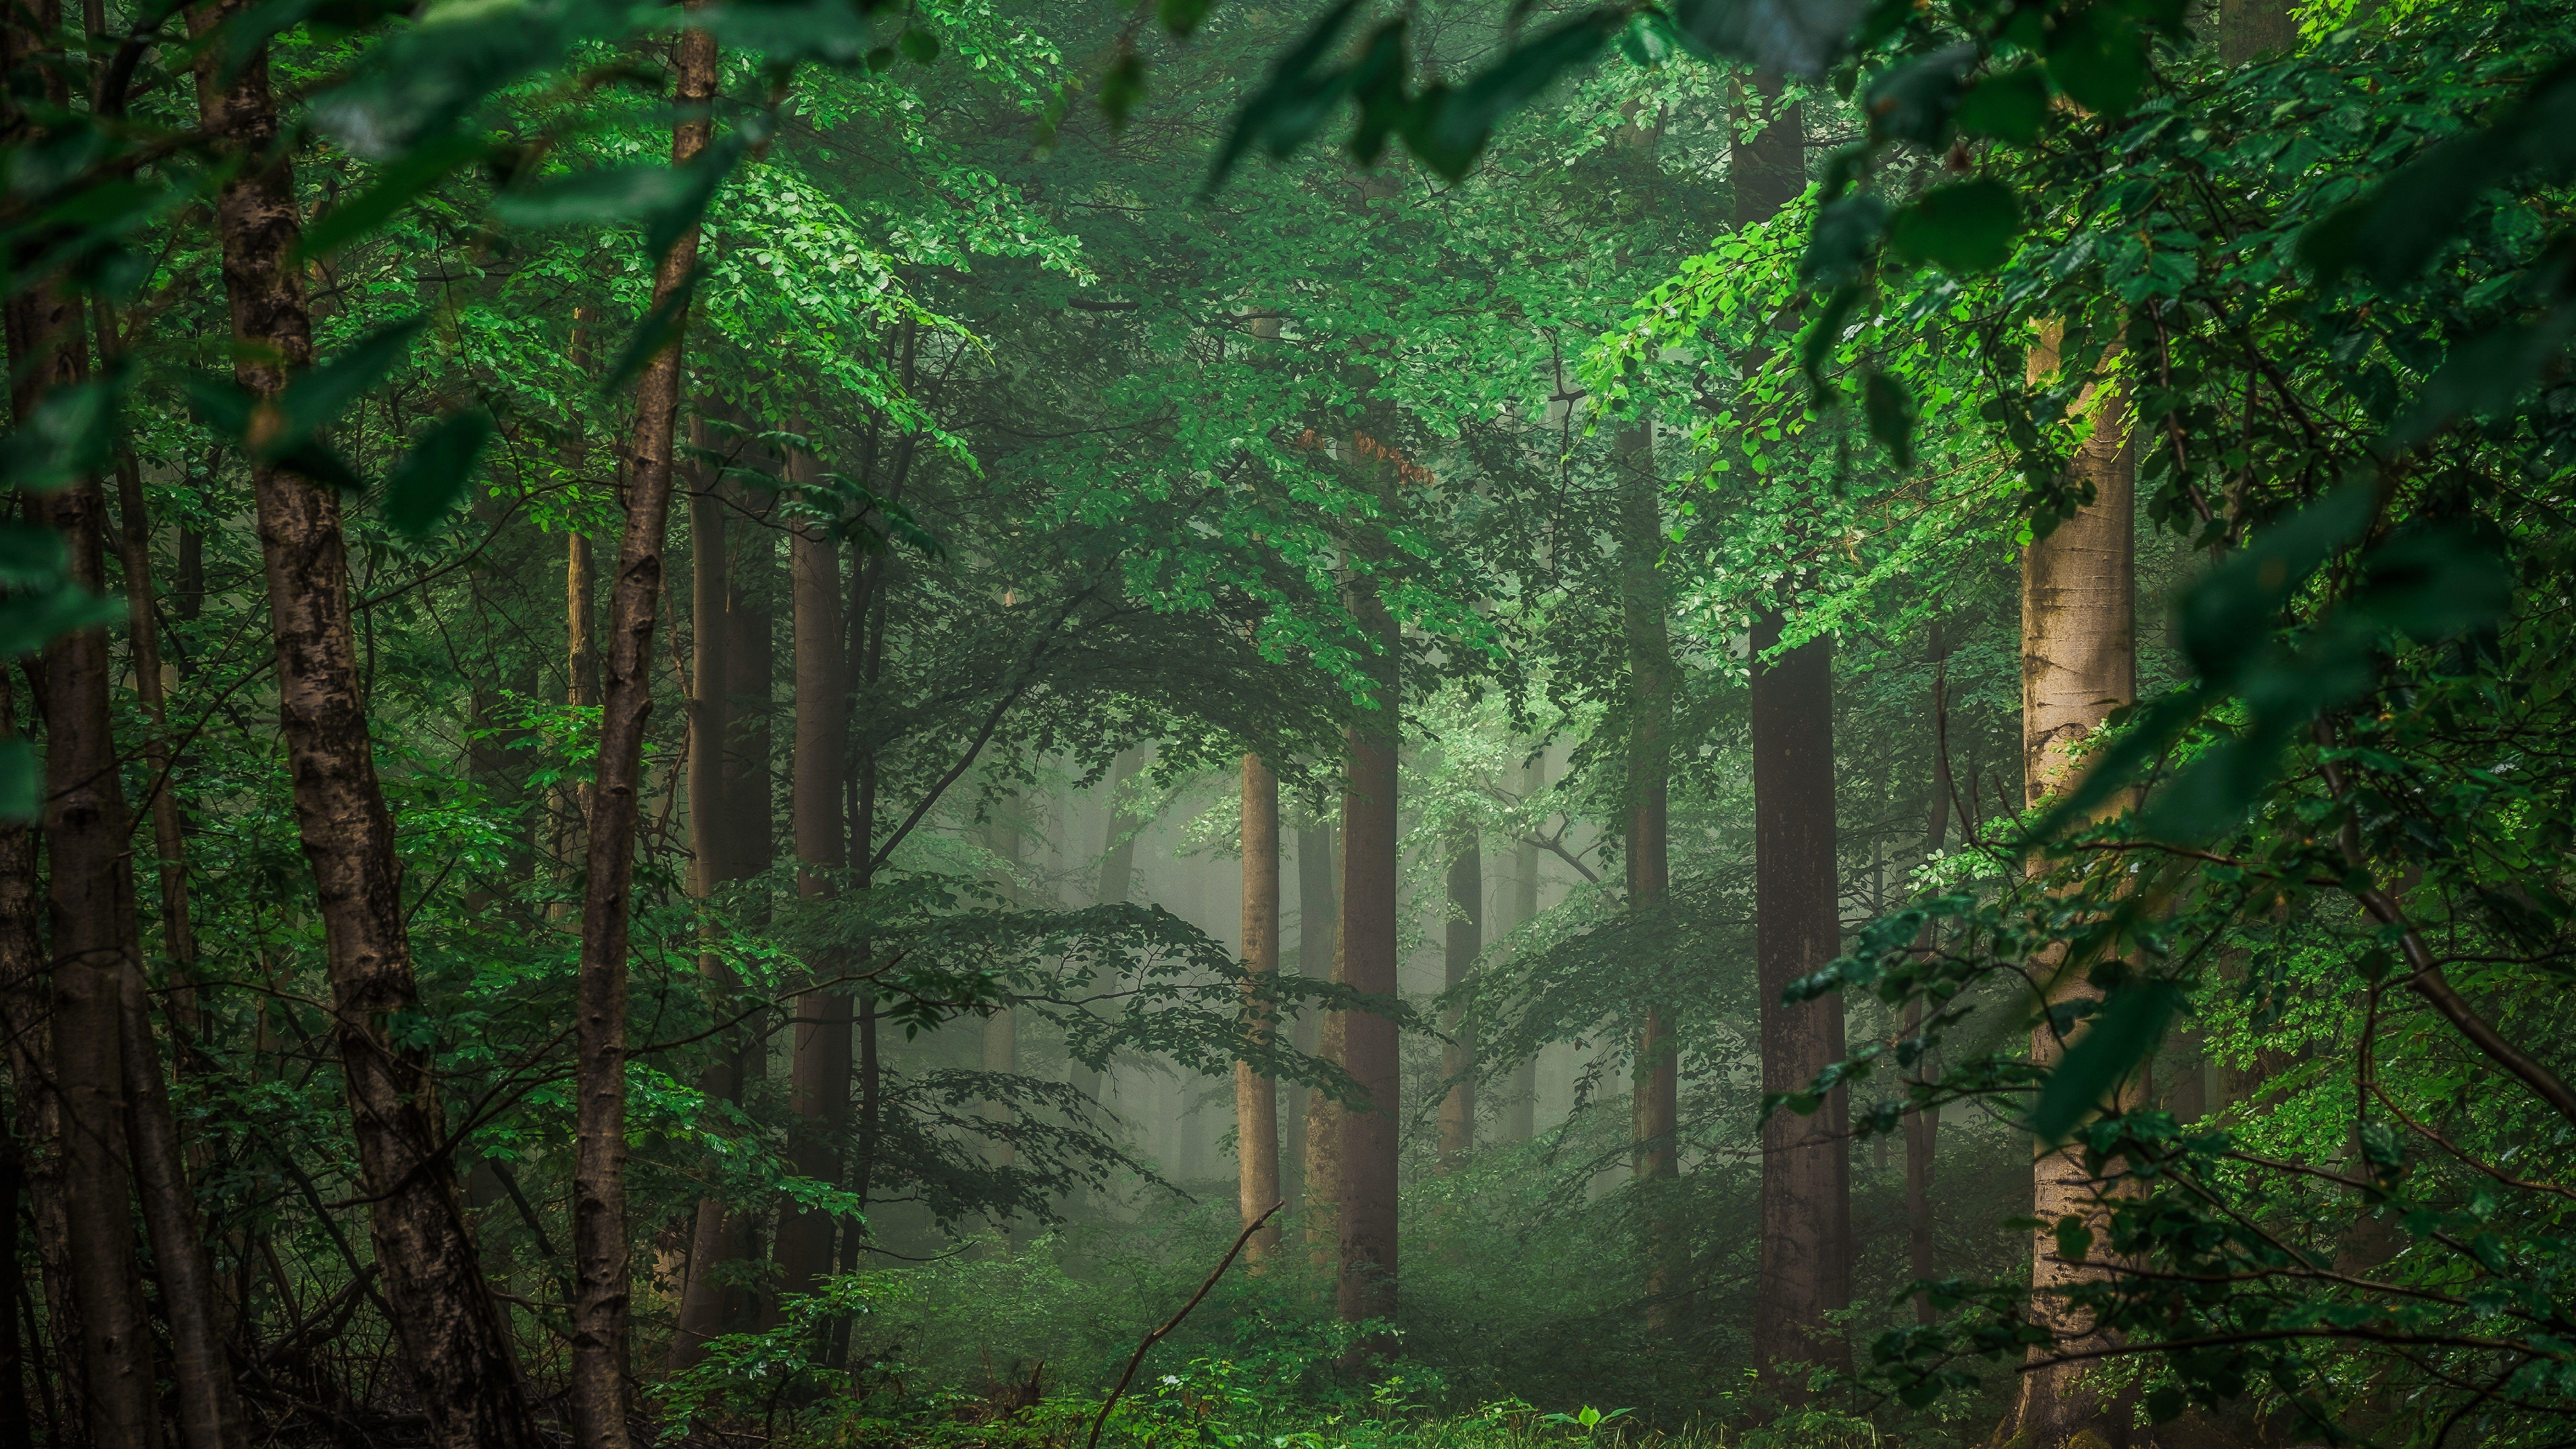 Vegetation Forest 8k Tree Green Leaves 8k Uhd Green Woodland